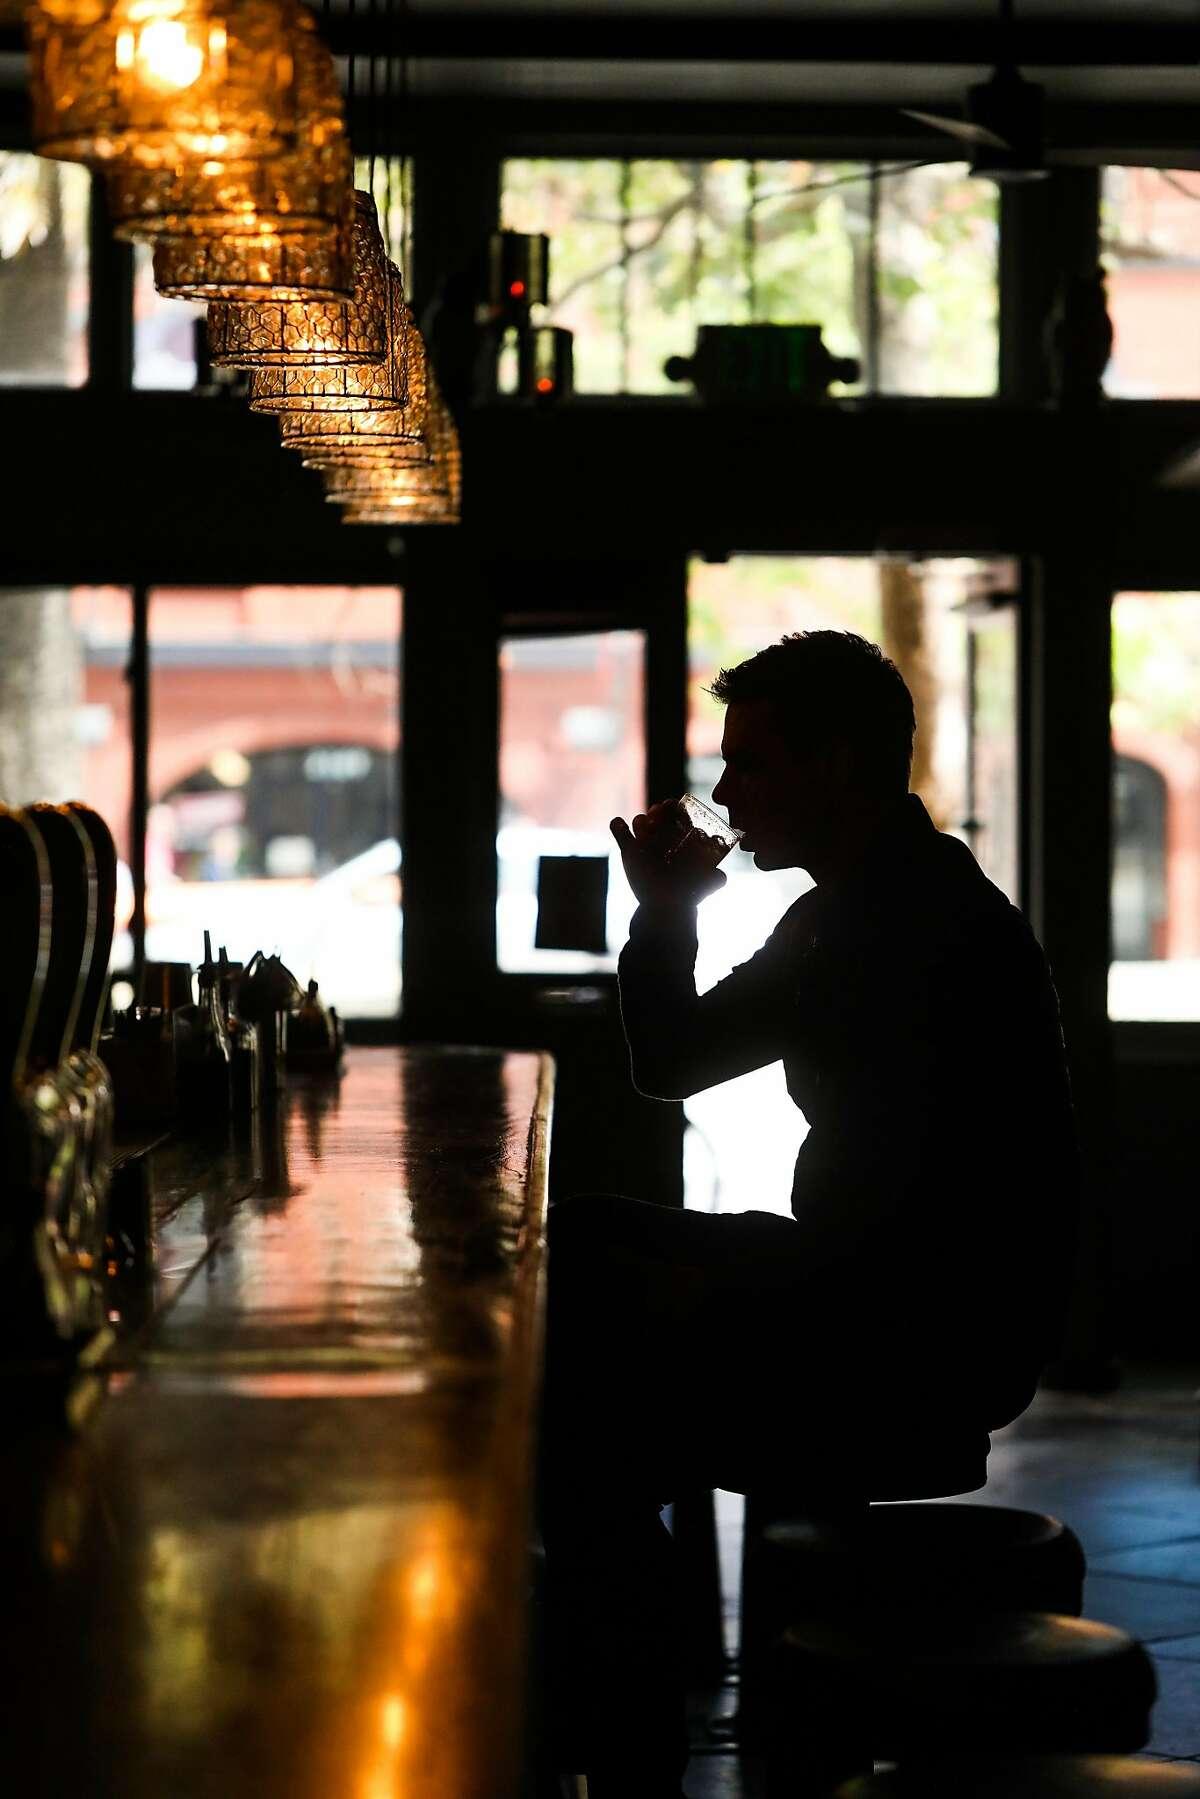 Jason Bishop has a drink at Blackbird bar in San Francisco, California, on Thursday, July 26, 2018.